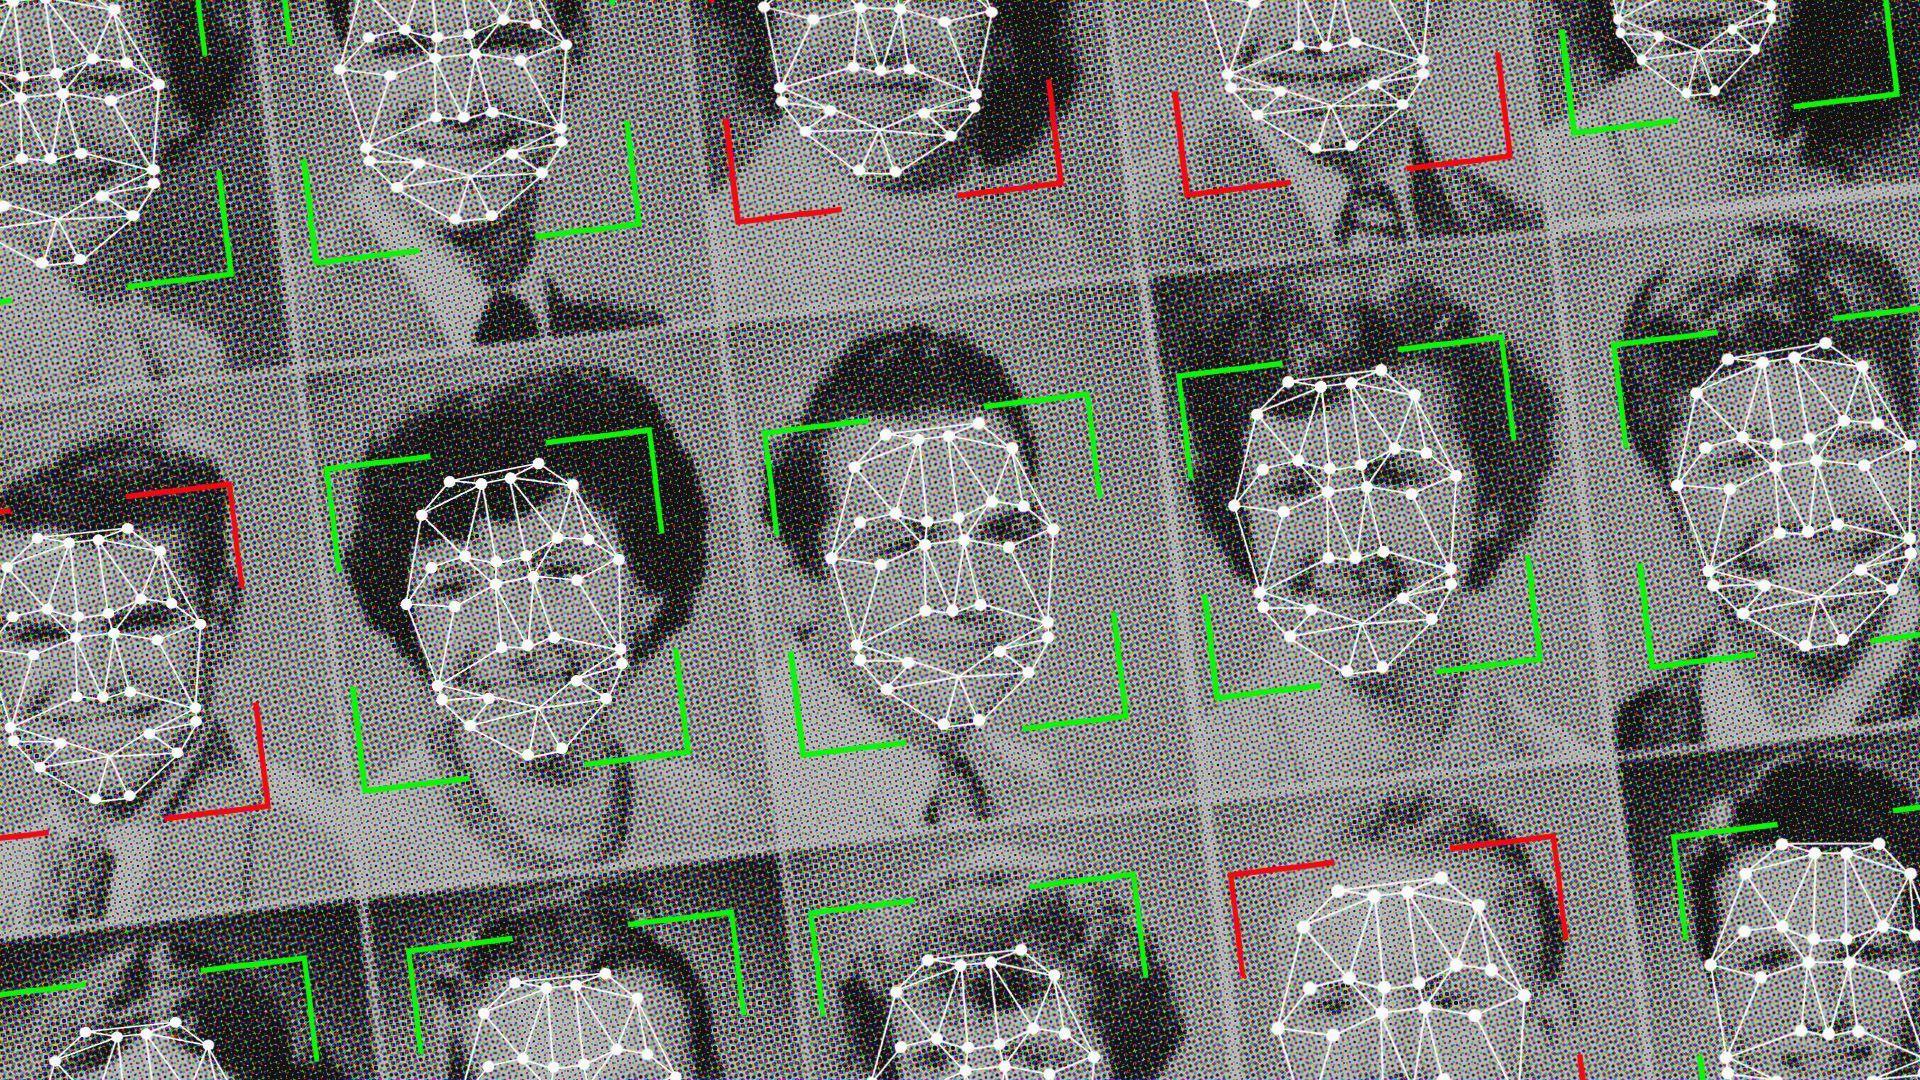 Facial recognition illustration